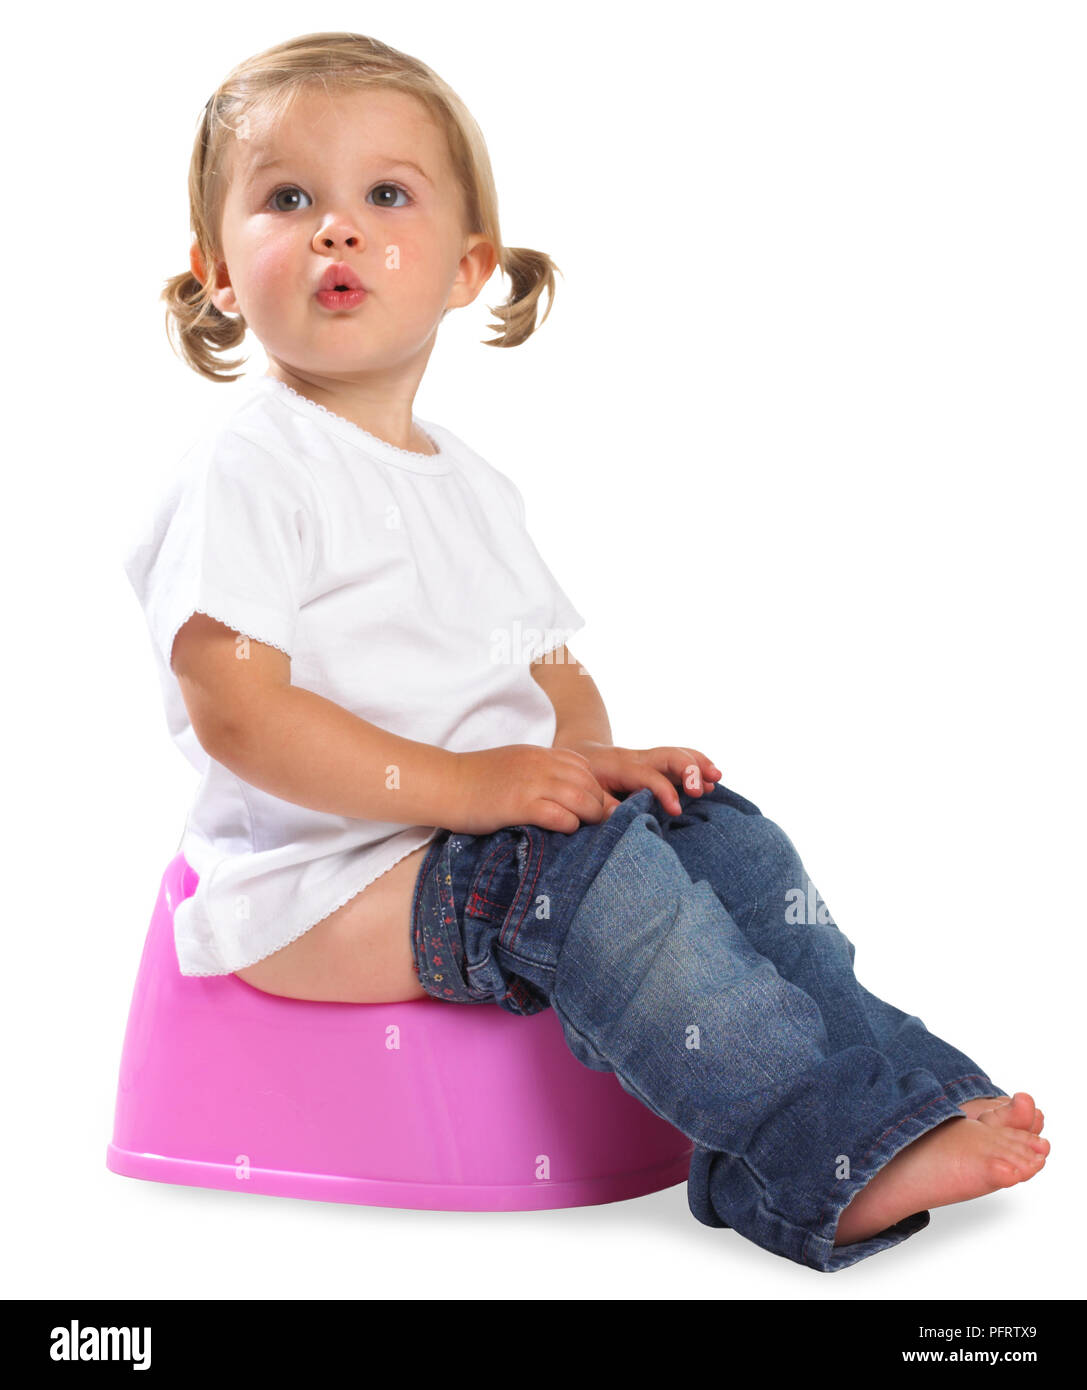 Girl sitting on pink potty, 1.5 years - Stock Image